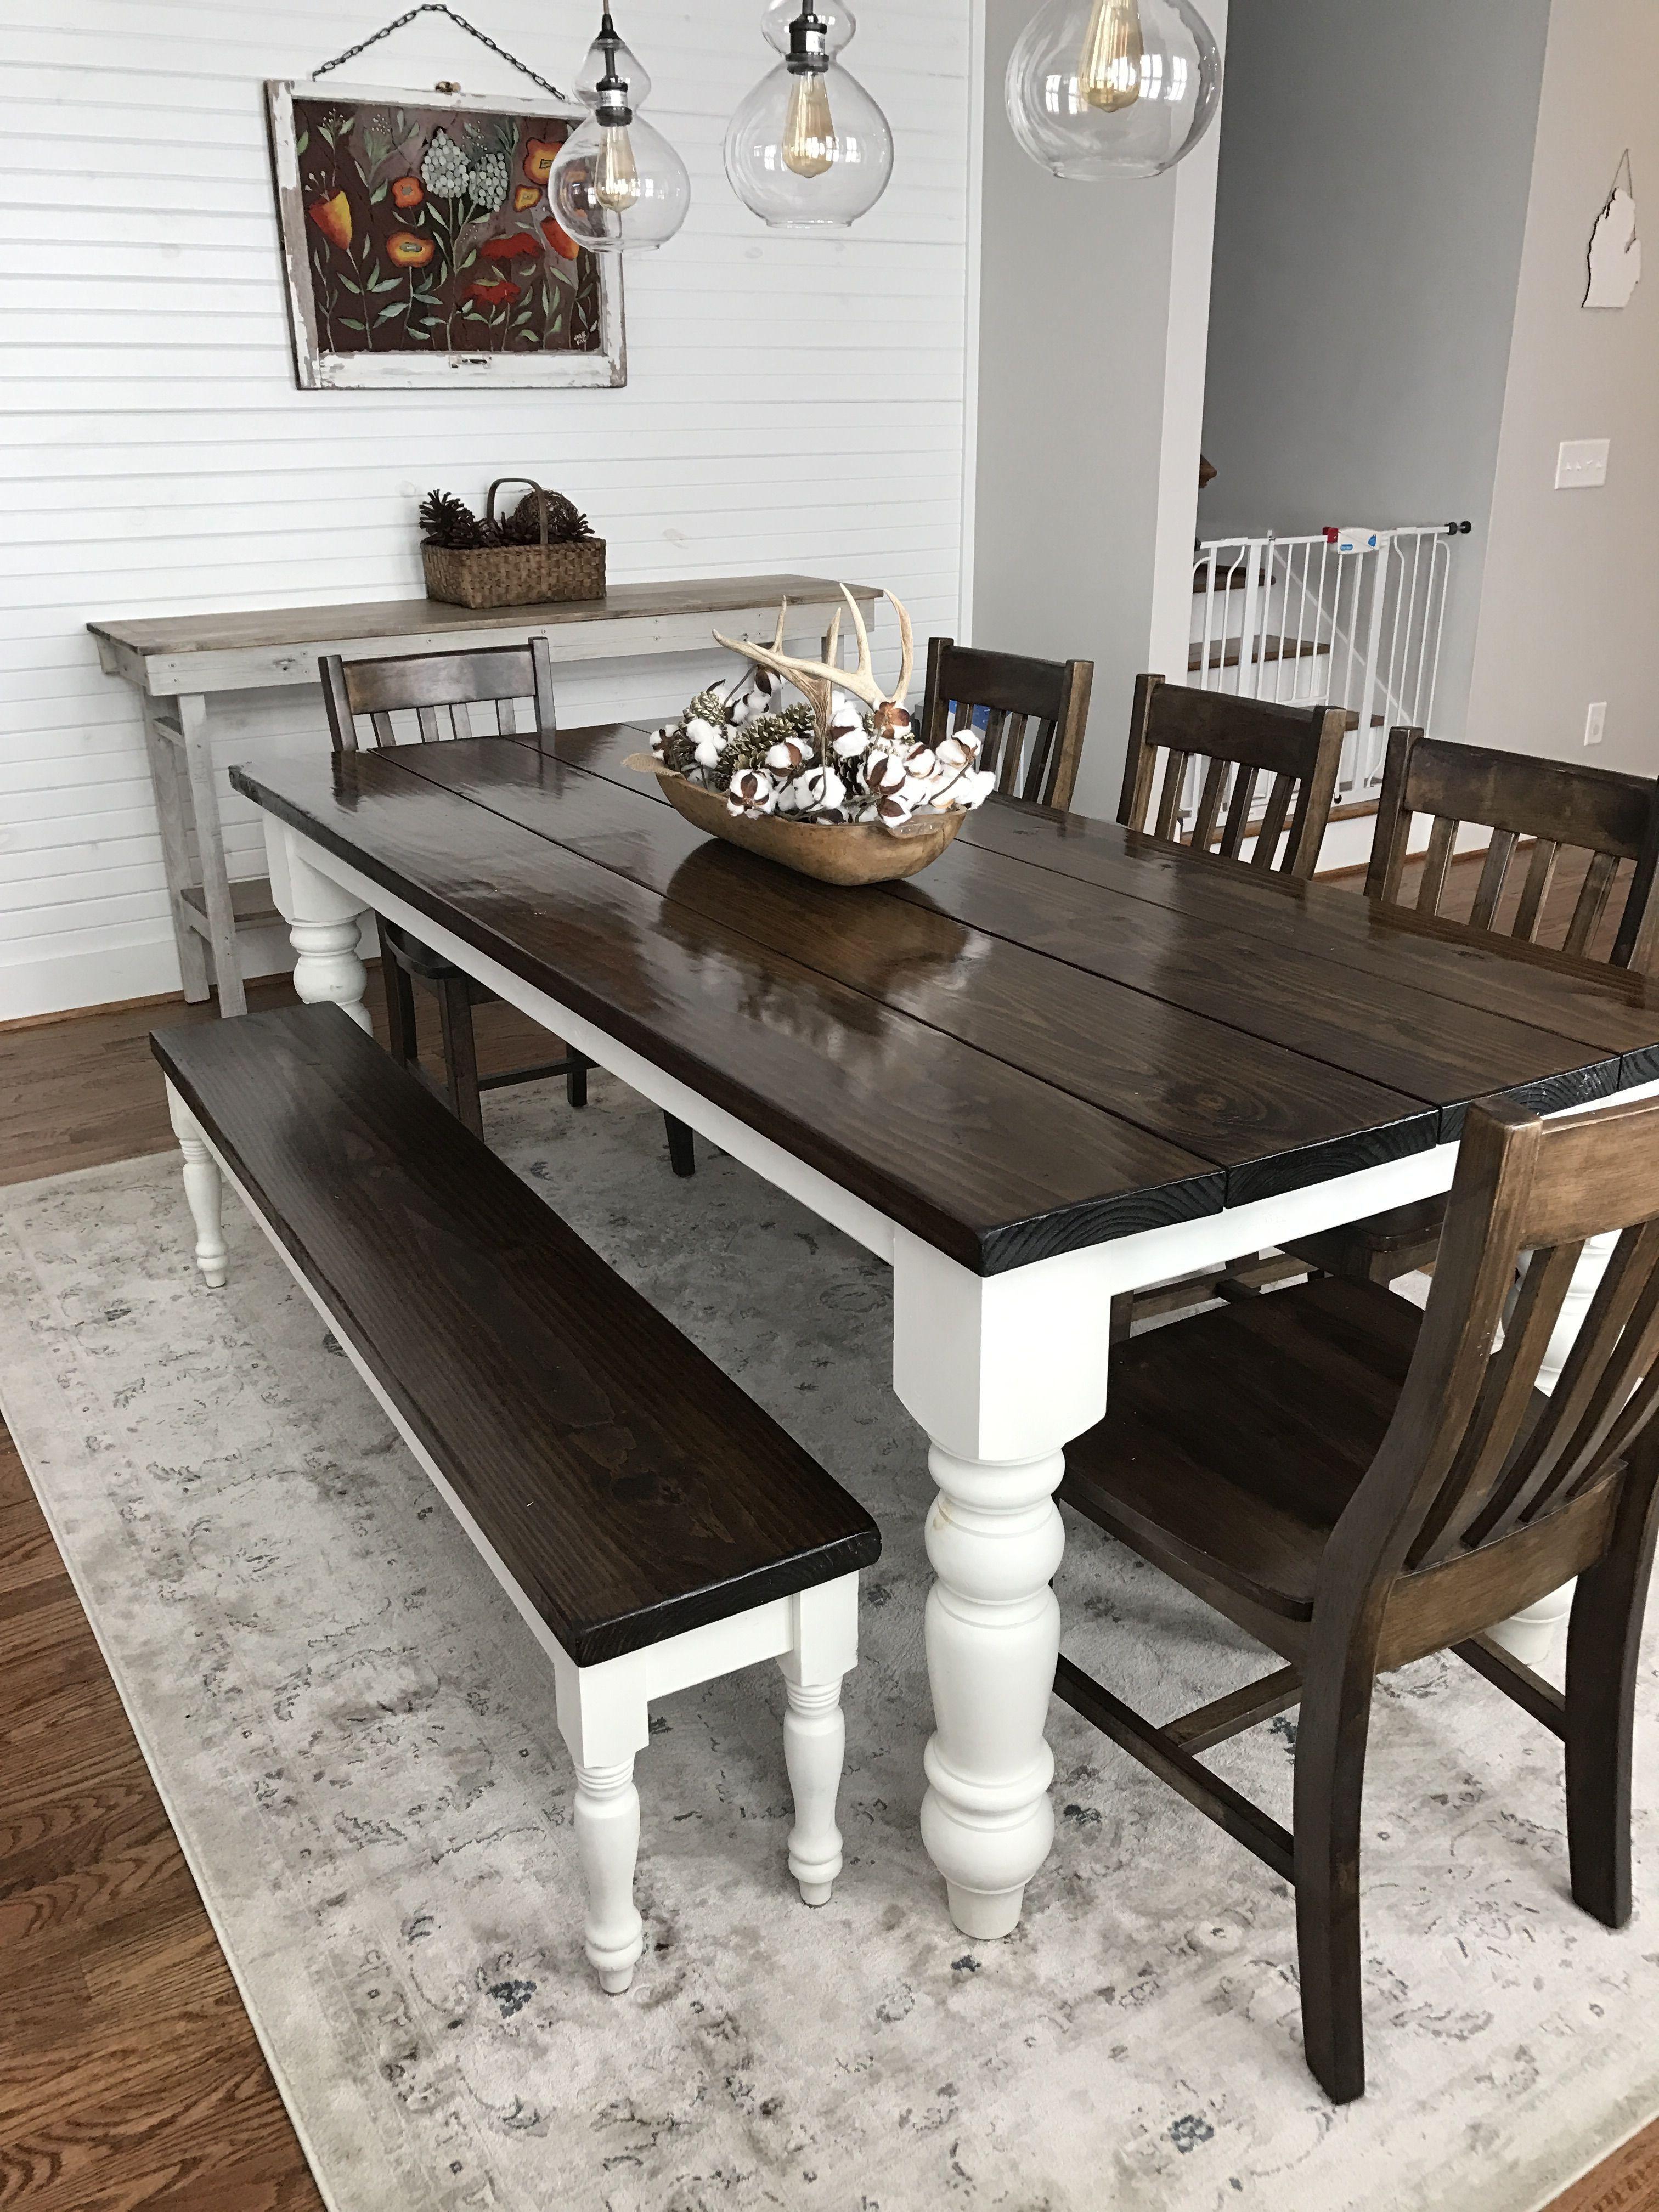 Beautiful Turn Kitchen Table Into Farmhouse Table The Awesome And Interesting Turn Kitchen Table Into Fa Rustikt Matbord Ideer For Heminredning Matsalsmobler Design your own kitchen table